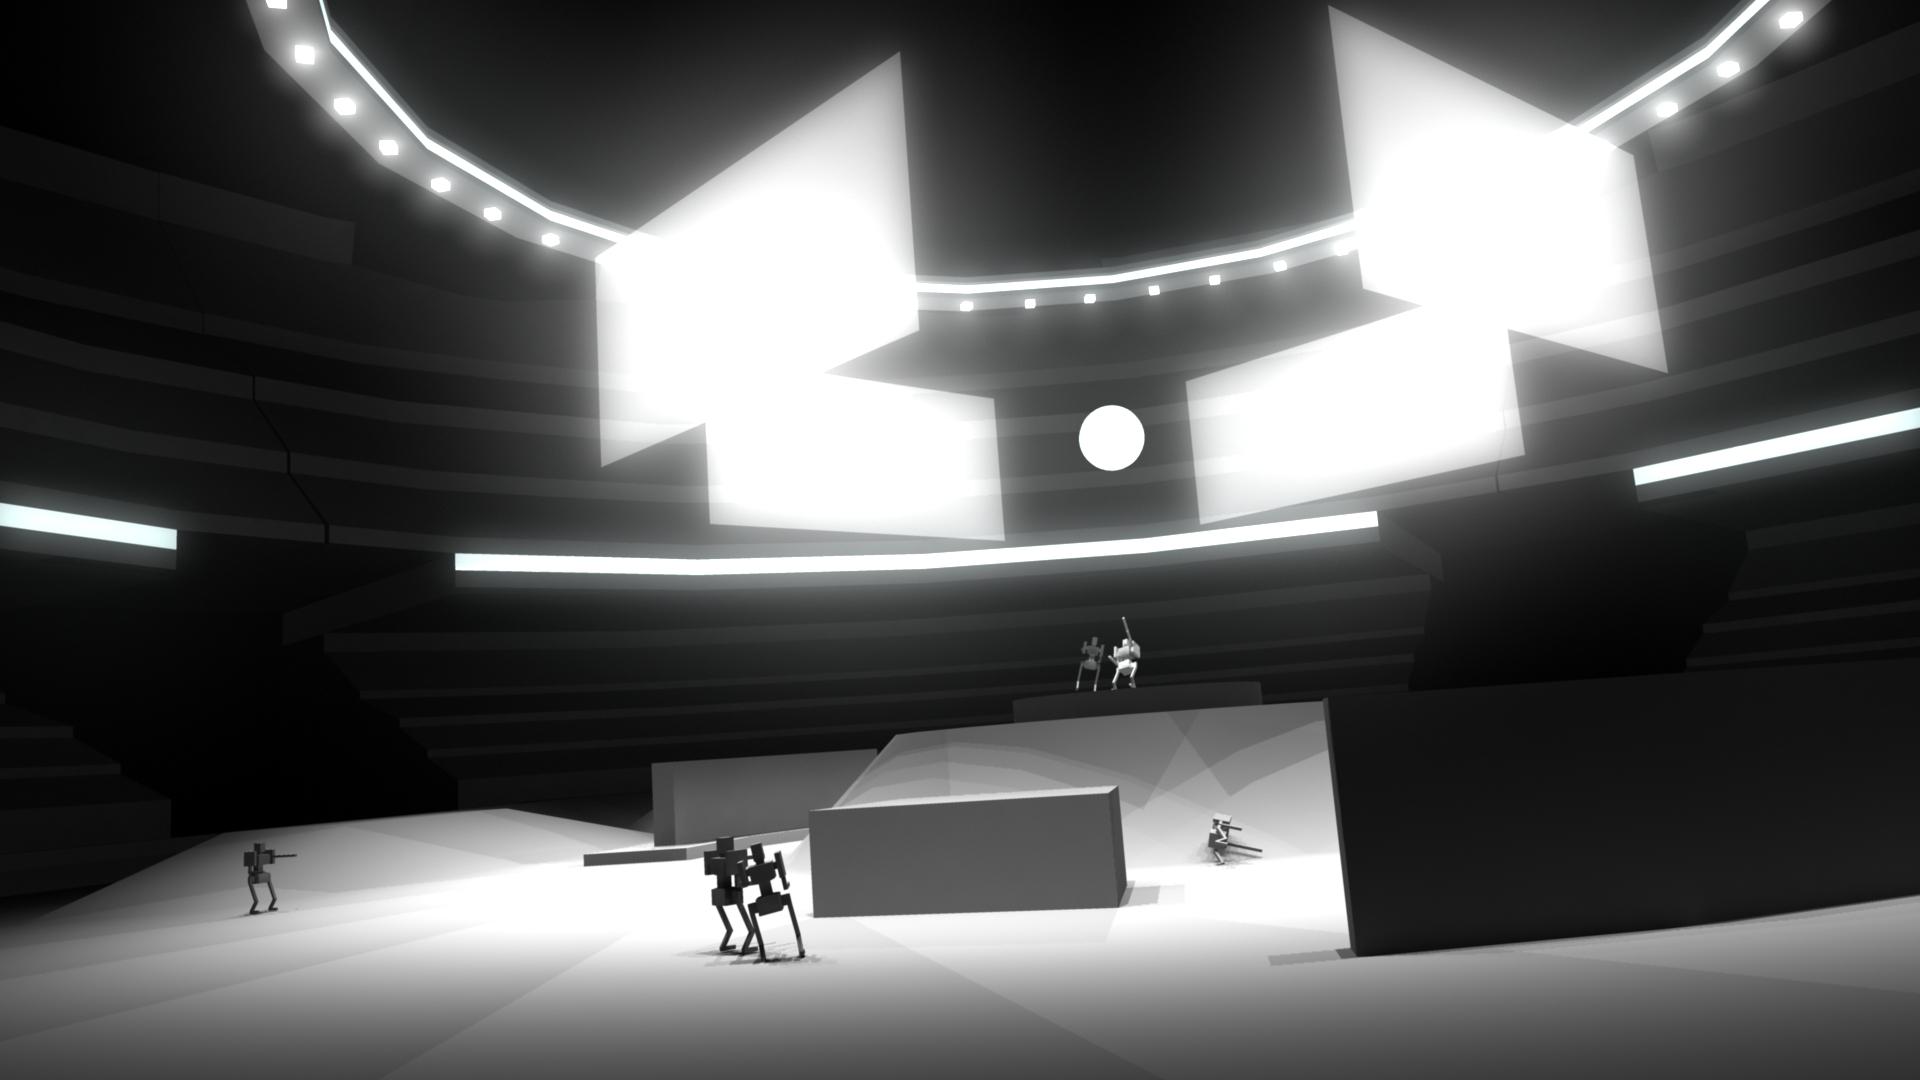 Rough Arena Model